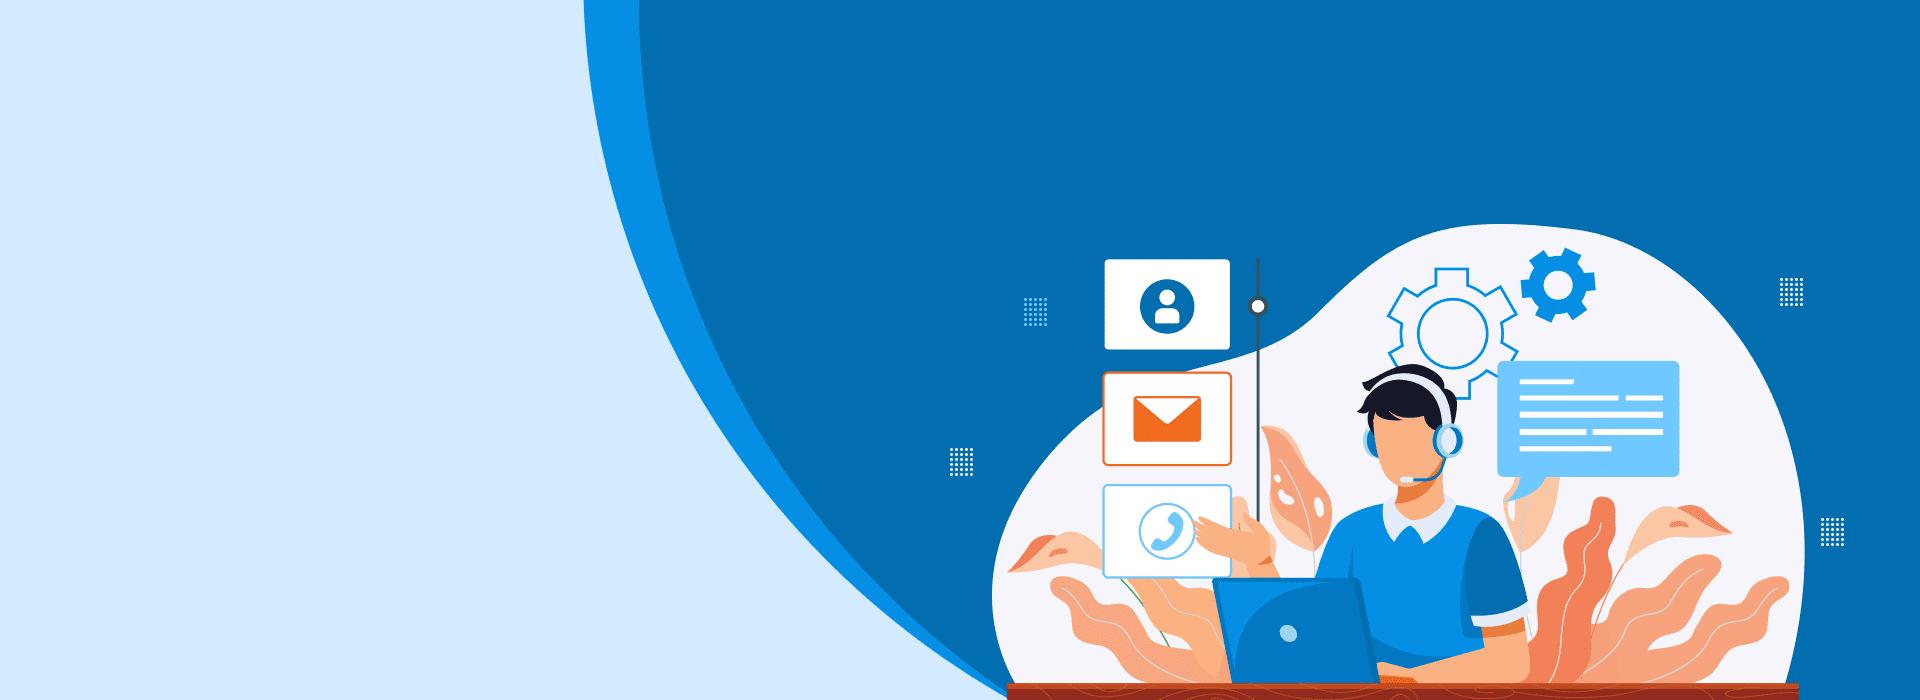 Ignatiuz HelpDesk App